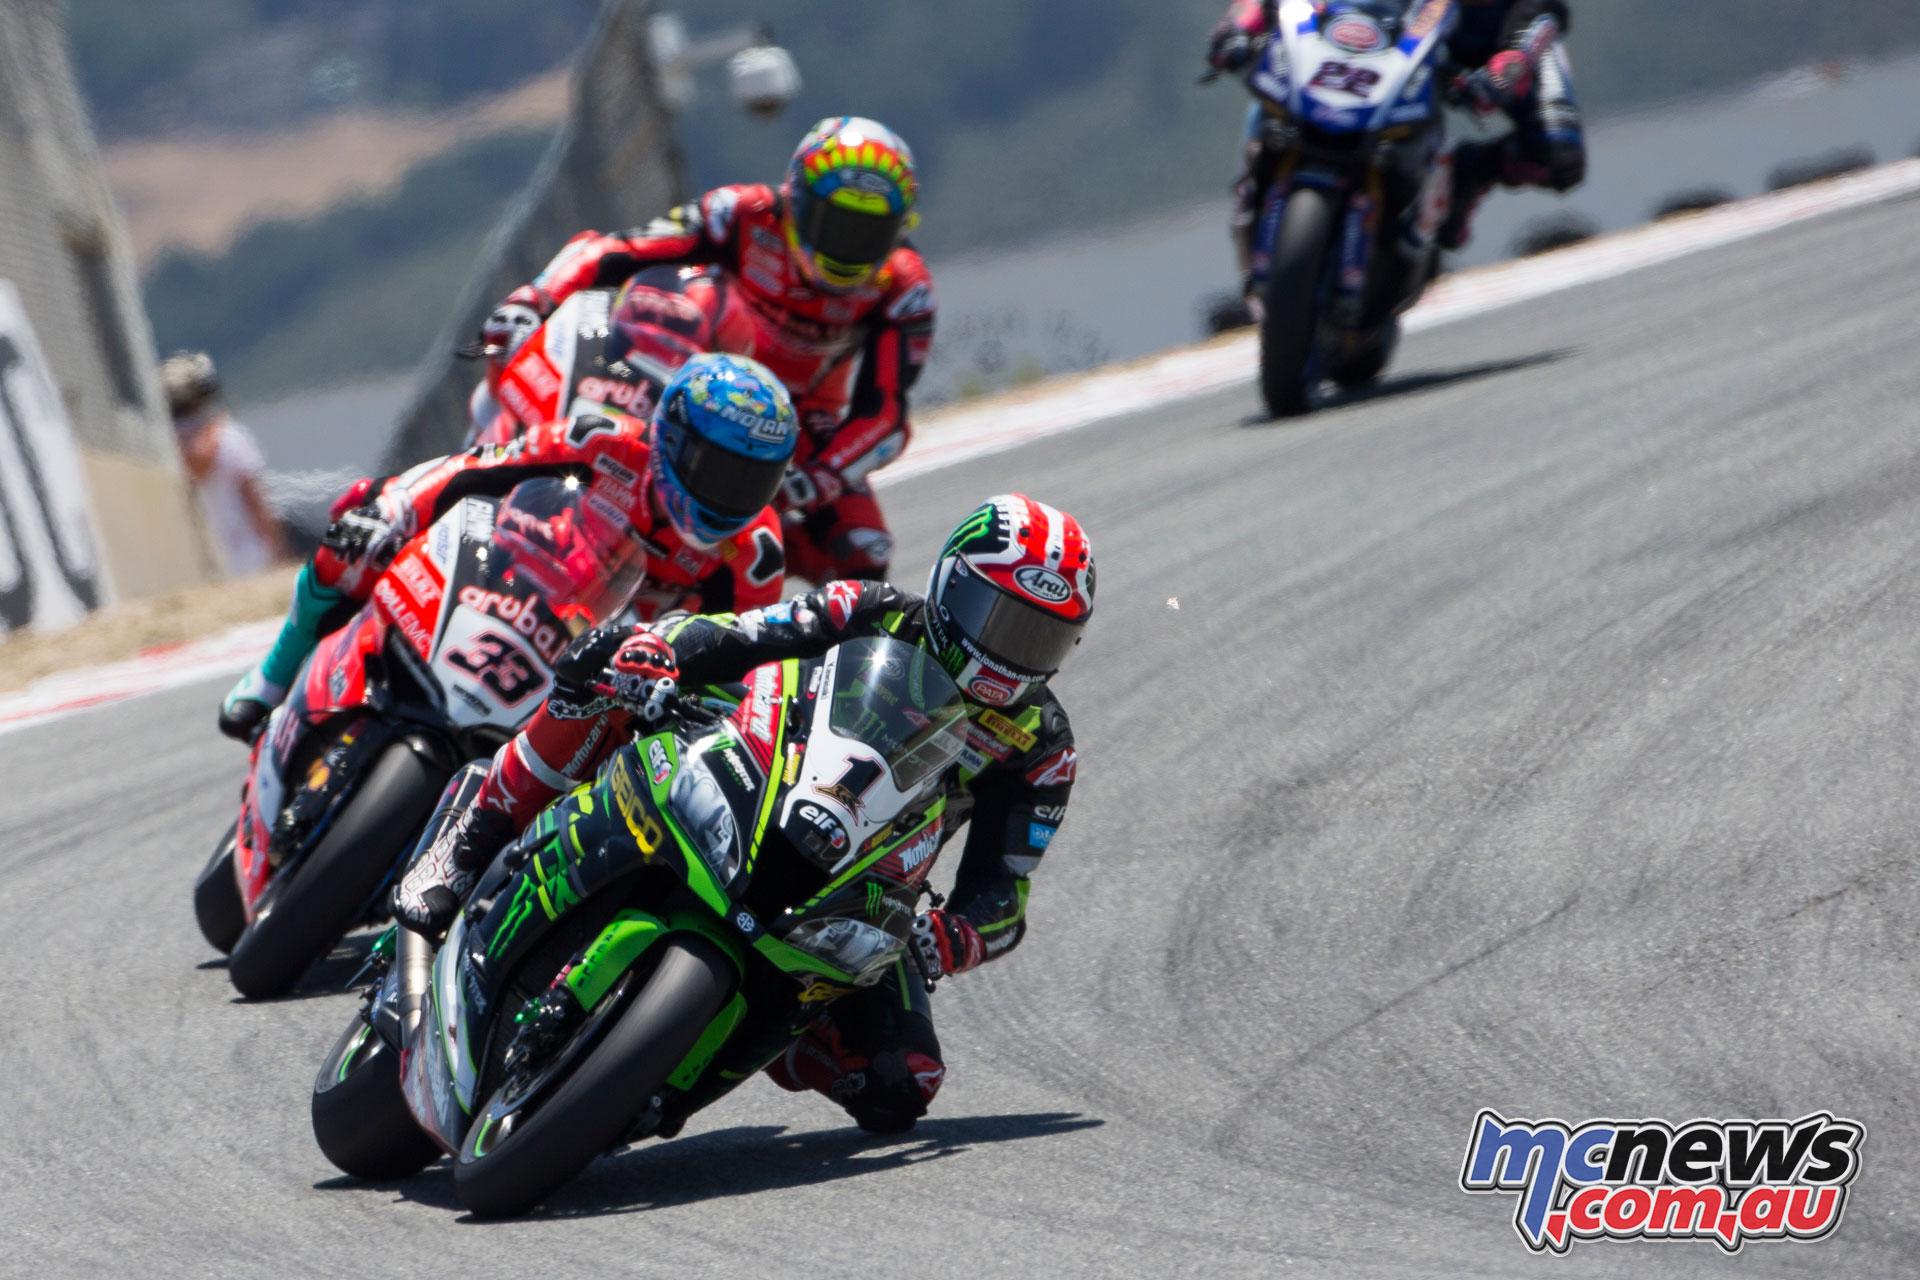 Laguna Seca Raceway >> WSBK lands at Laguna Seca | Preview | AEST schedule ...